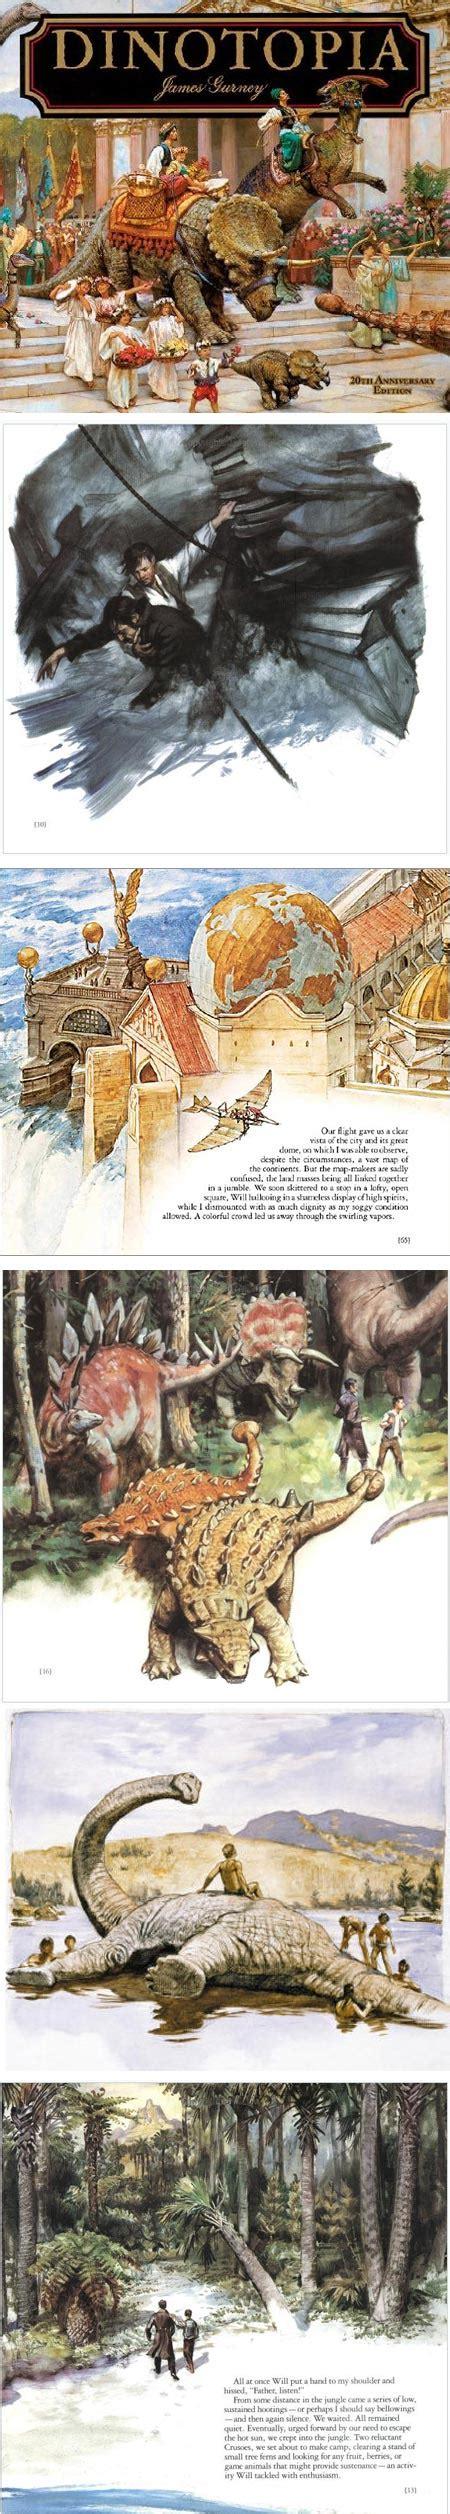 Pdf Dinotopia Land Apart Time Anniversary by Dinotopia 20th Anniversary Edition Lines And Colors